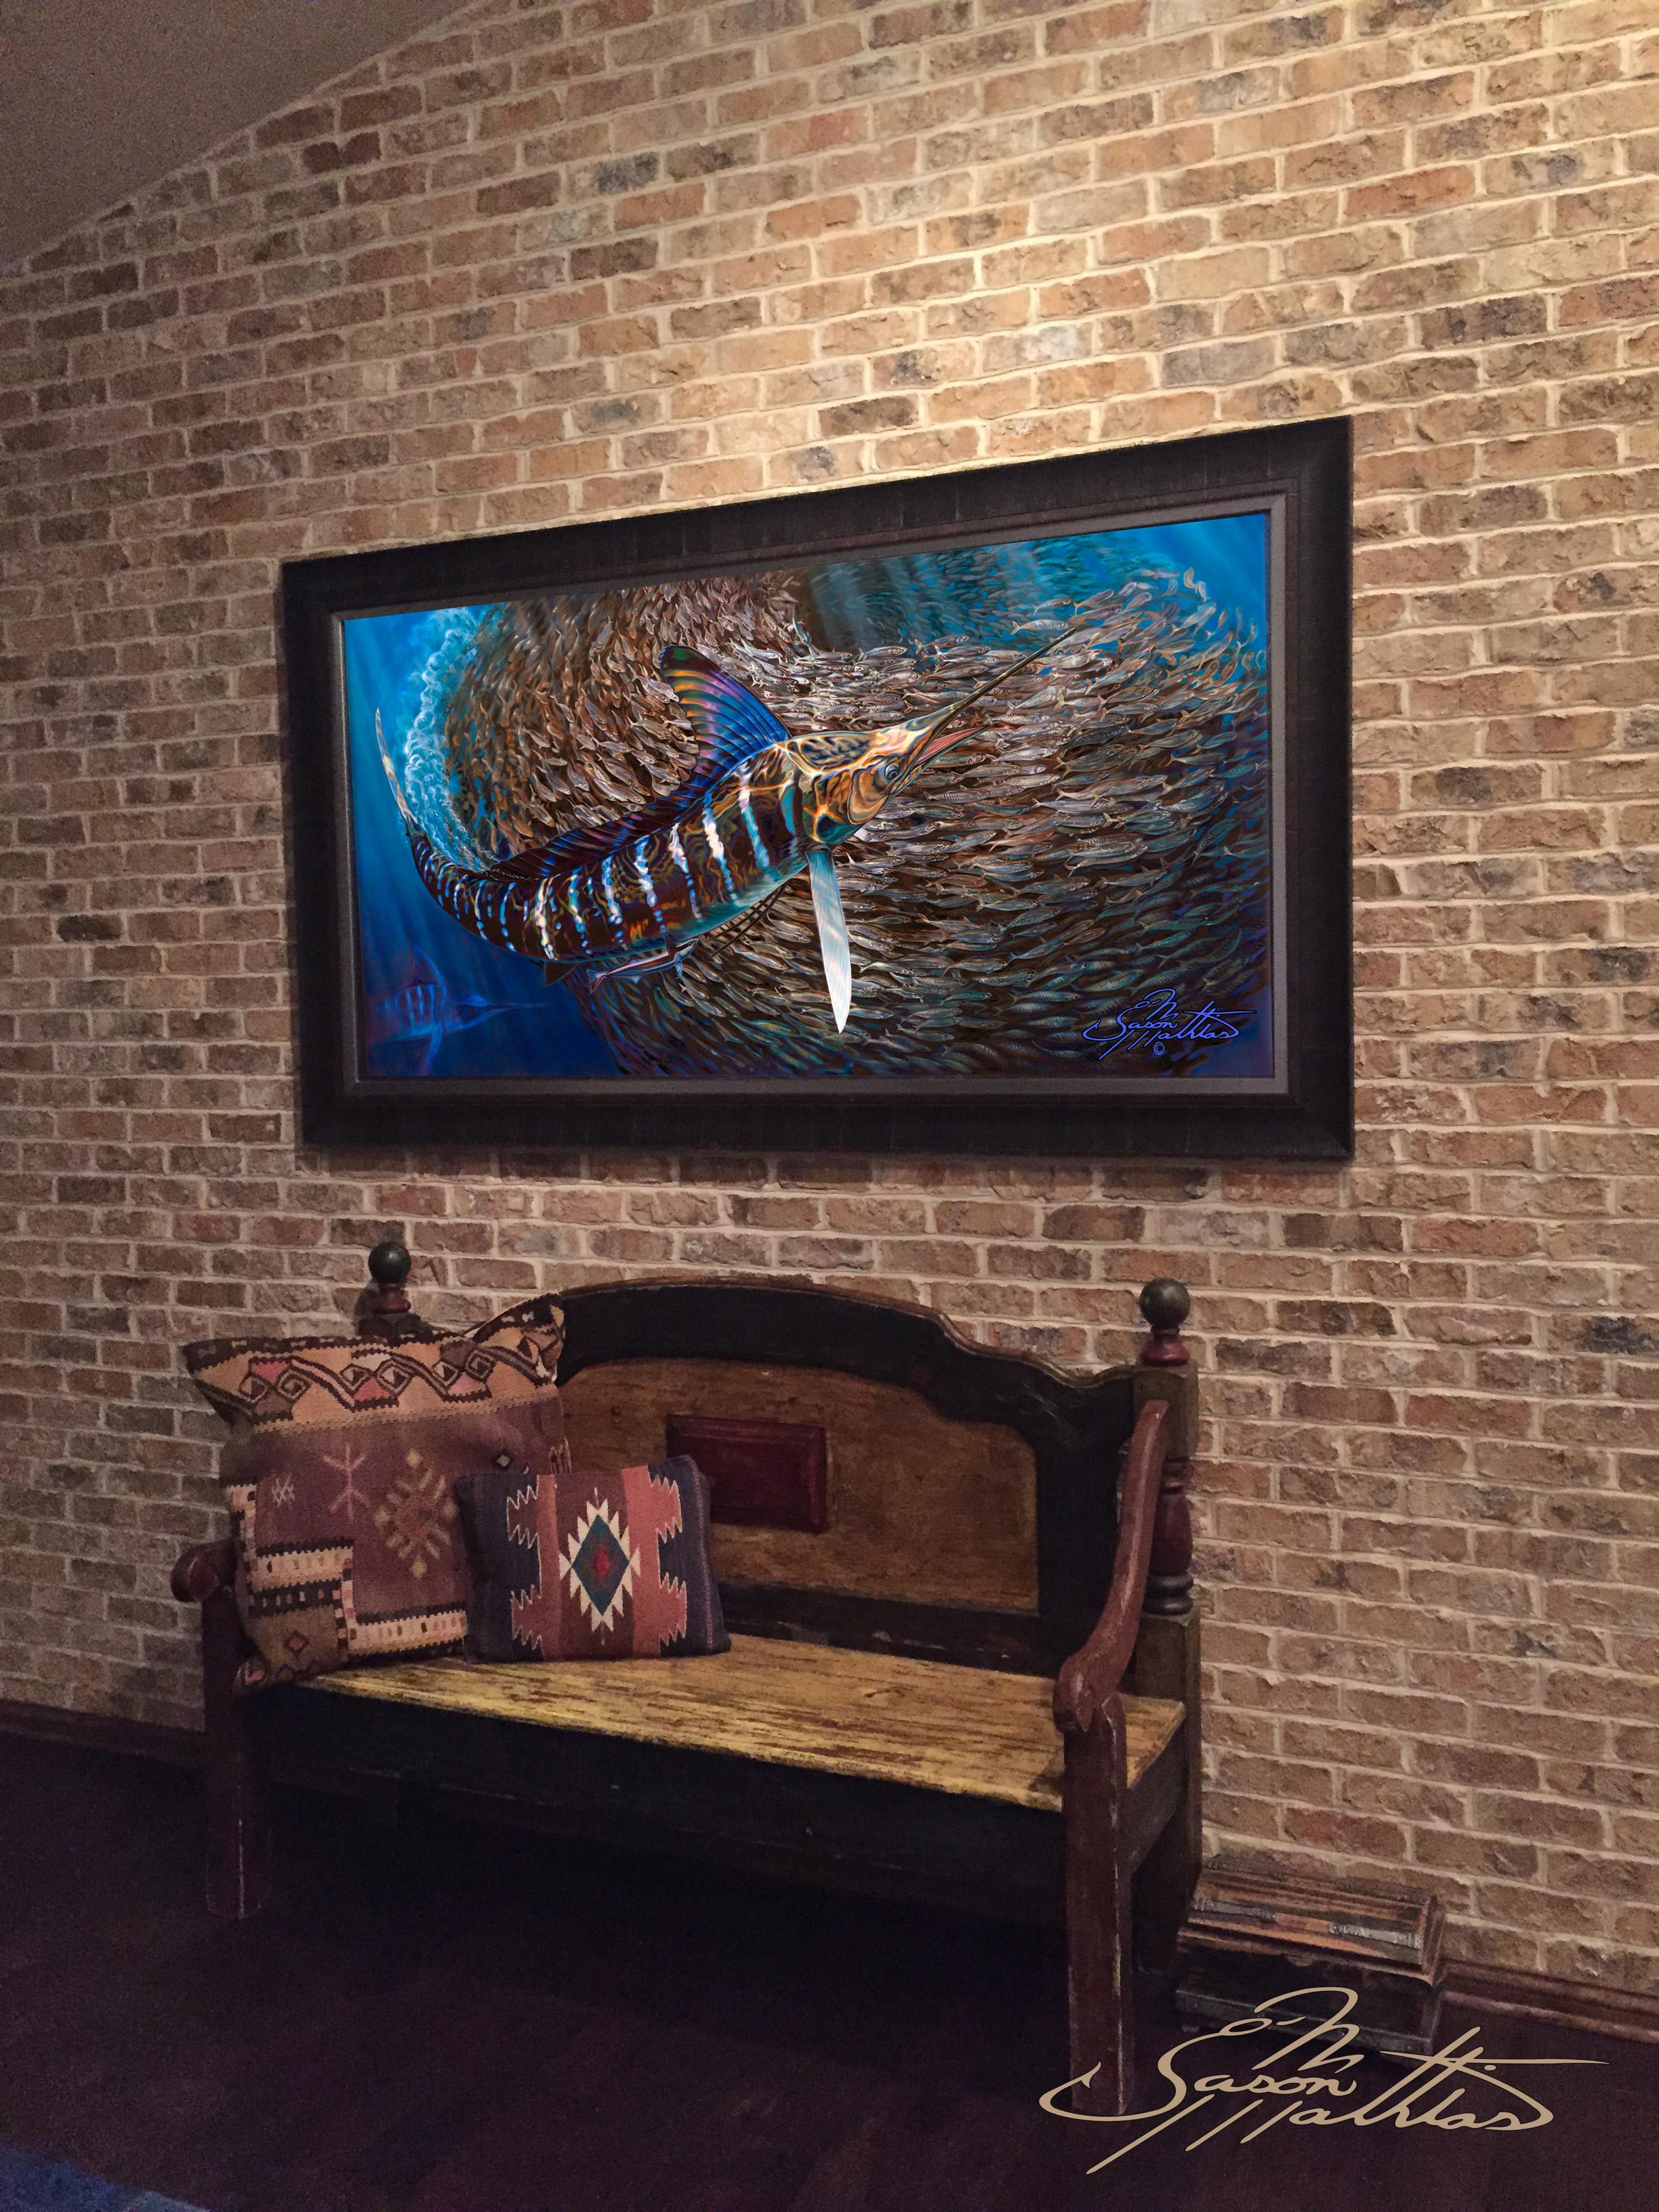 striped-marlin-painting-art-jason-mathias.jpg